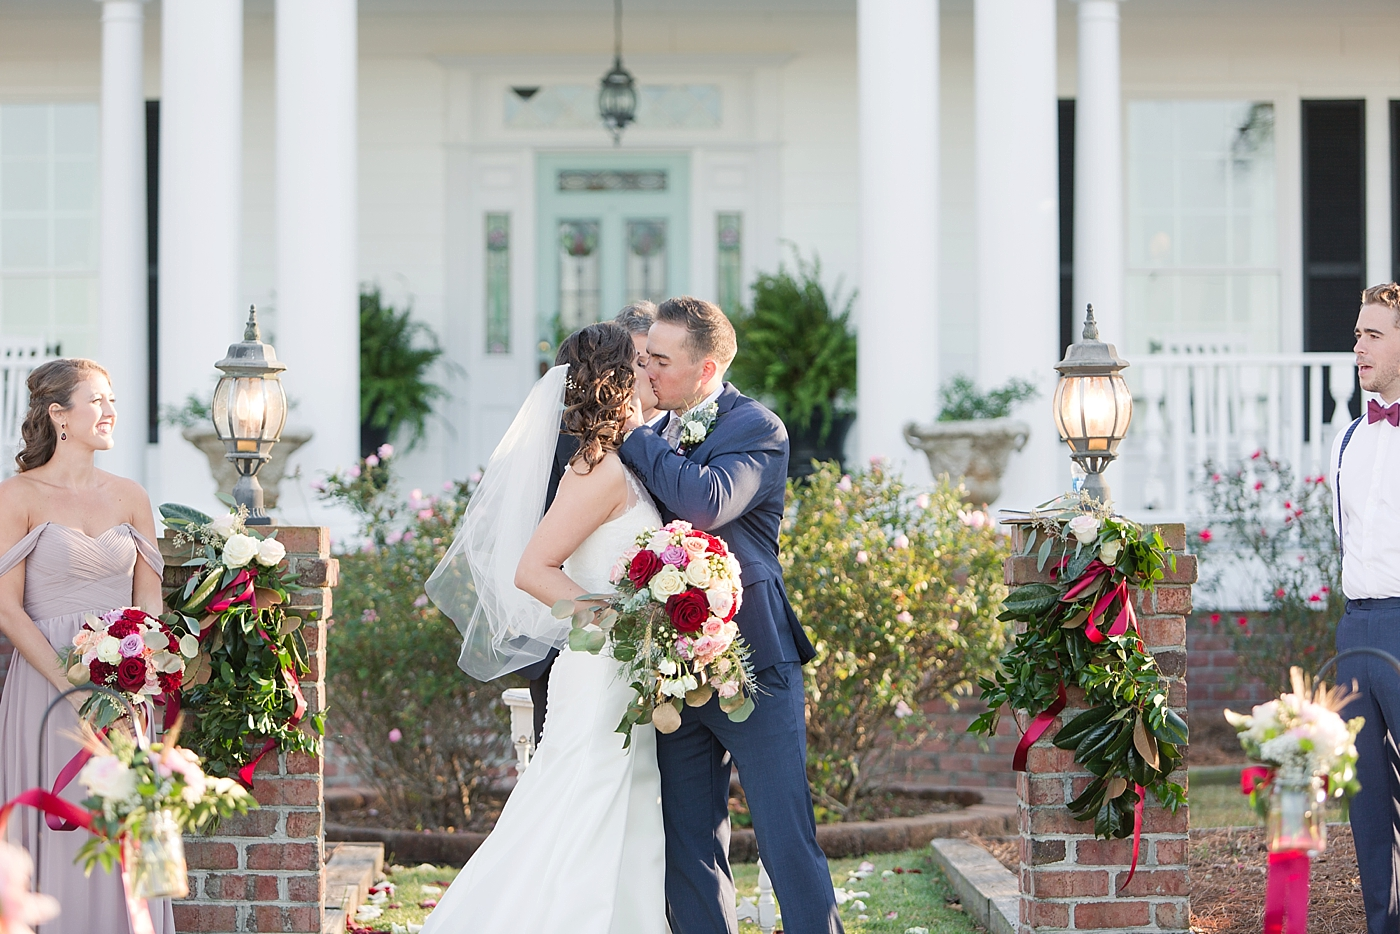 greenville-nc-wedding-the-robins-nest_23.jpg